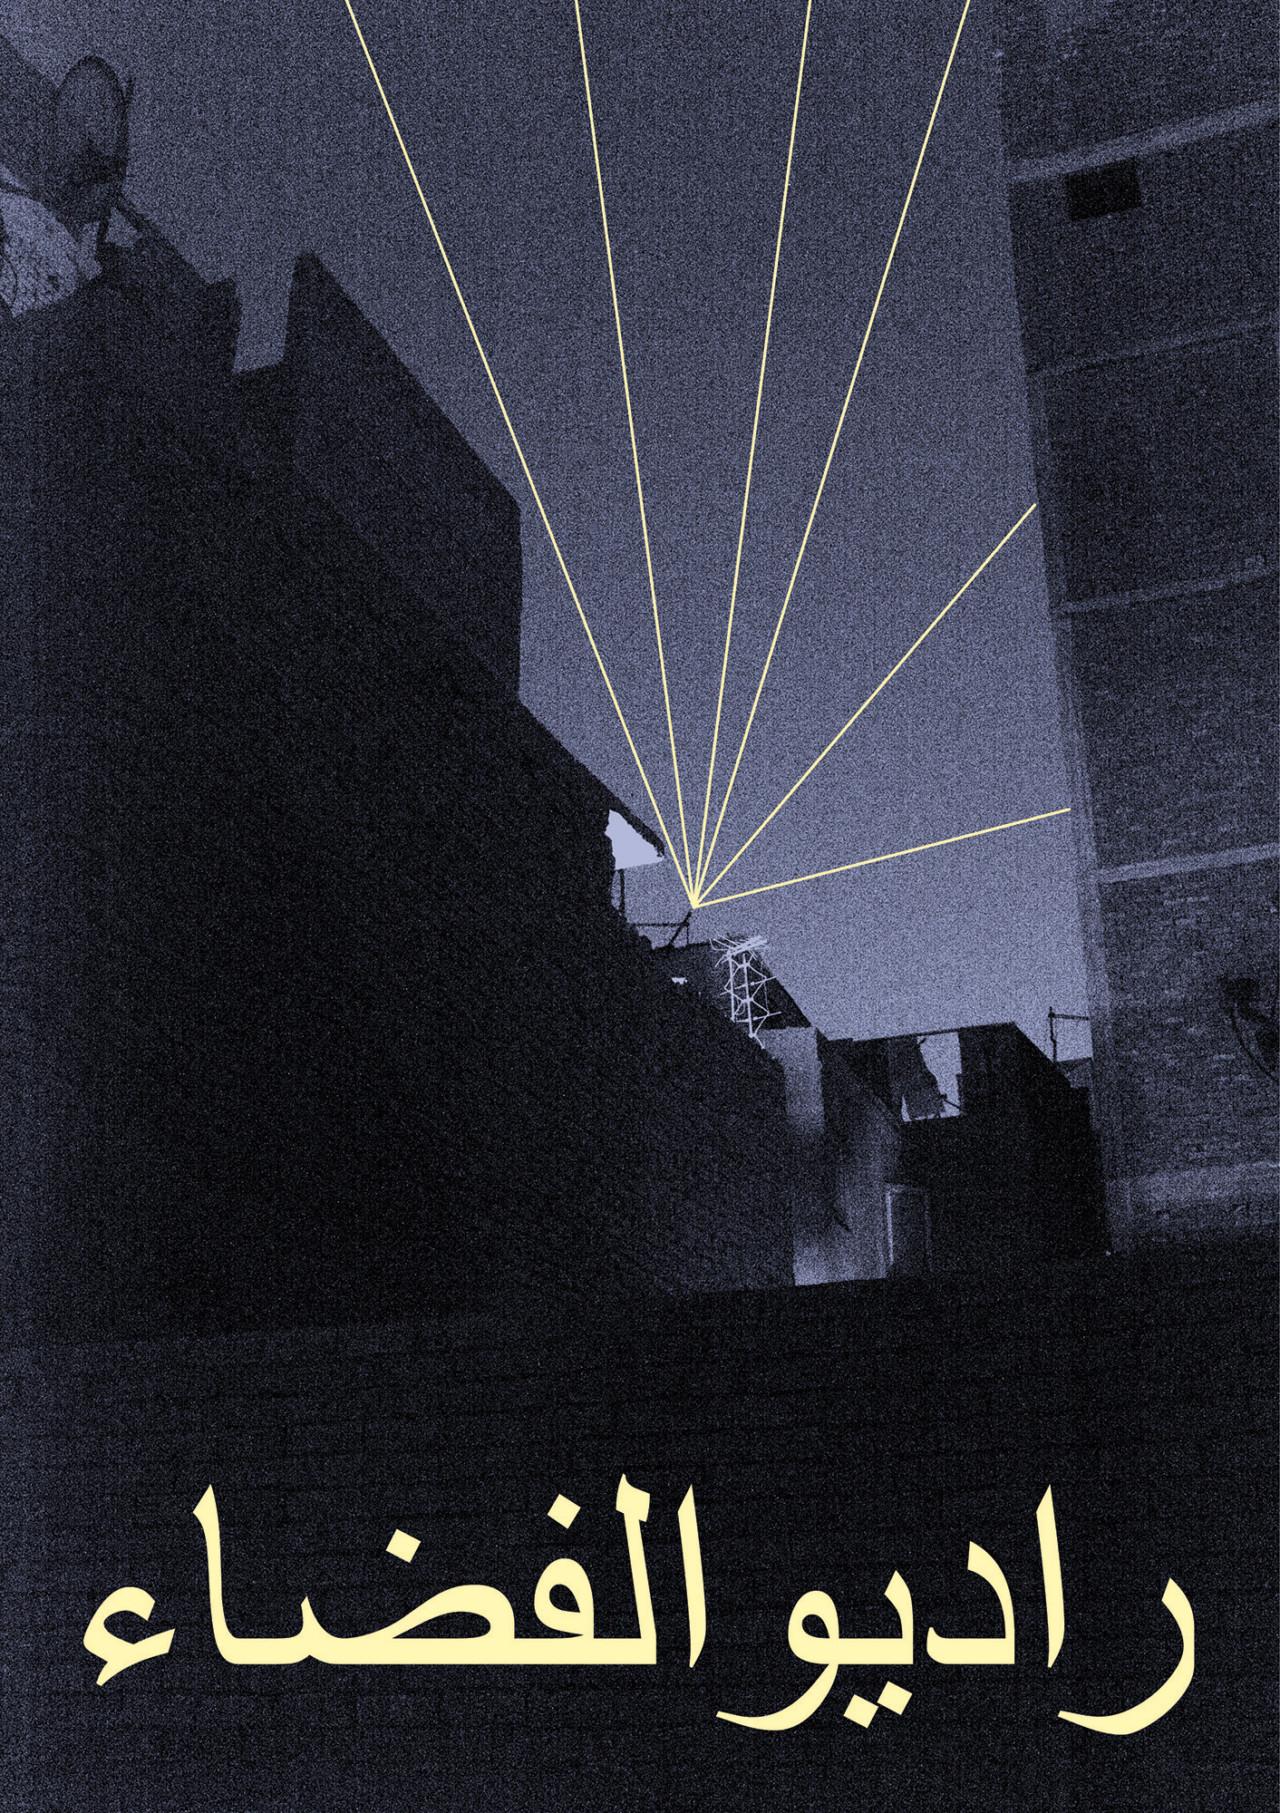 Shirin Omran Cairo posters